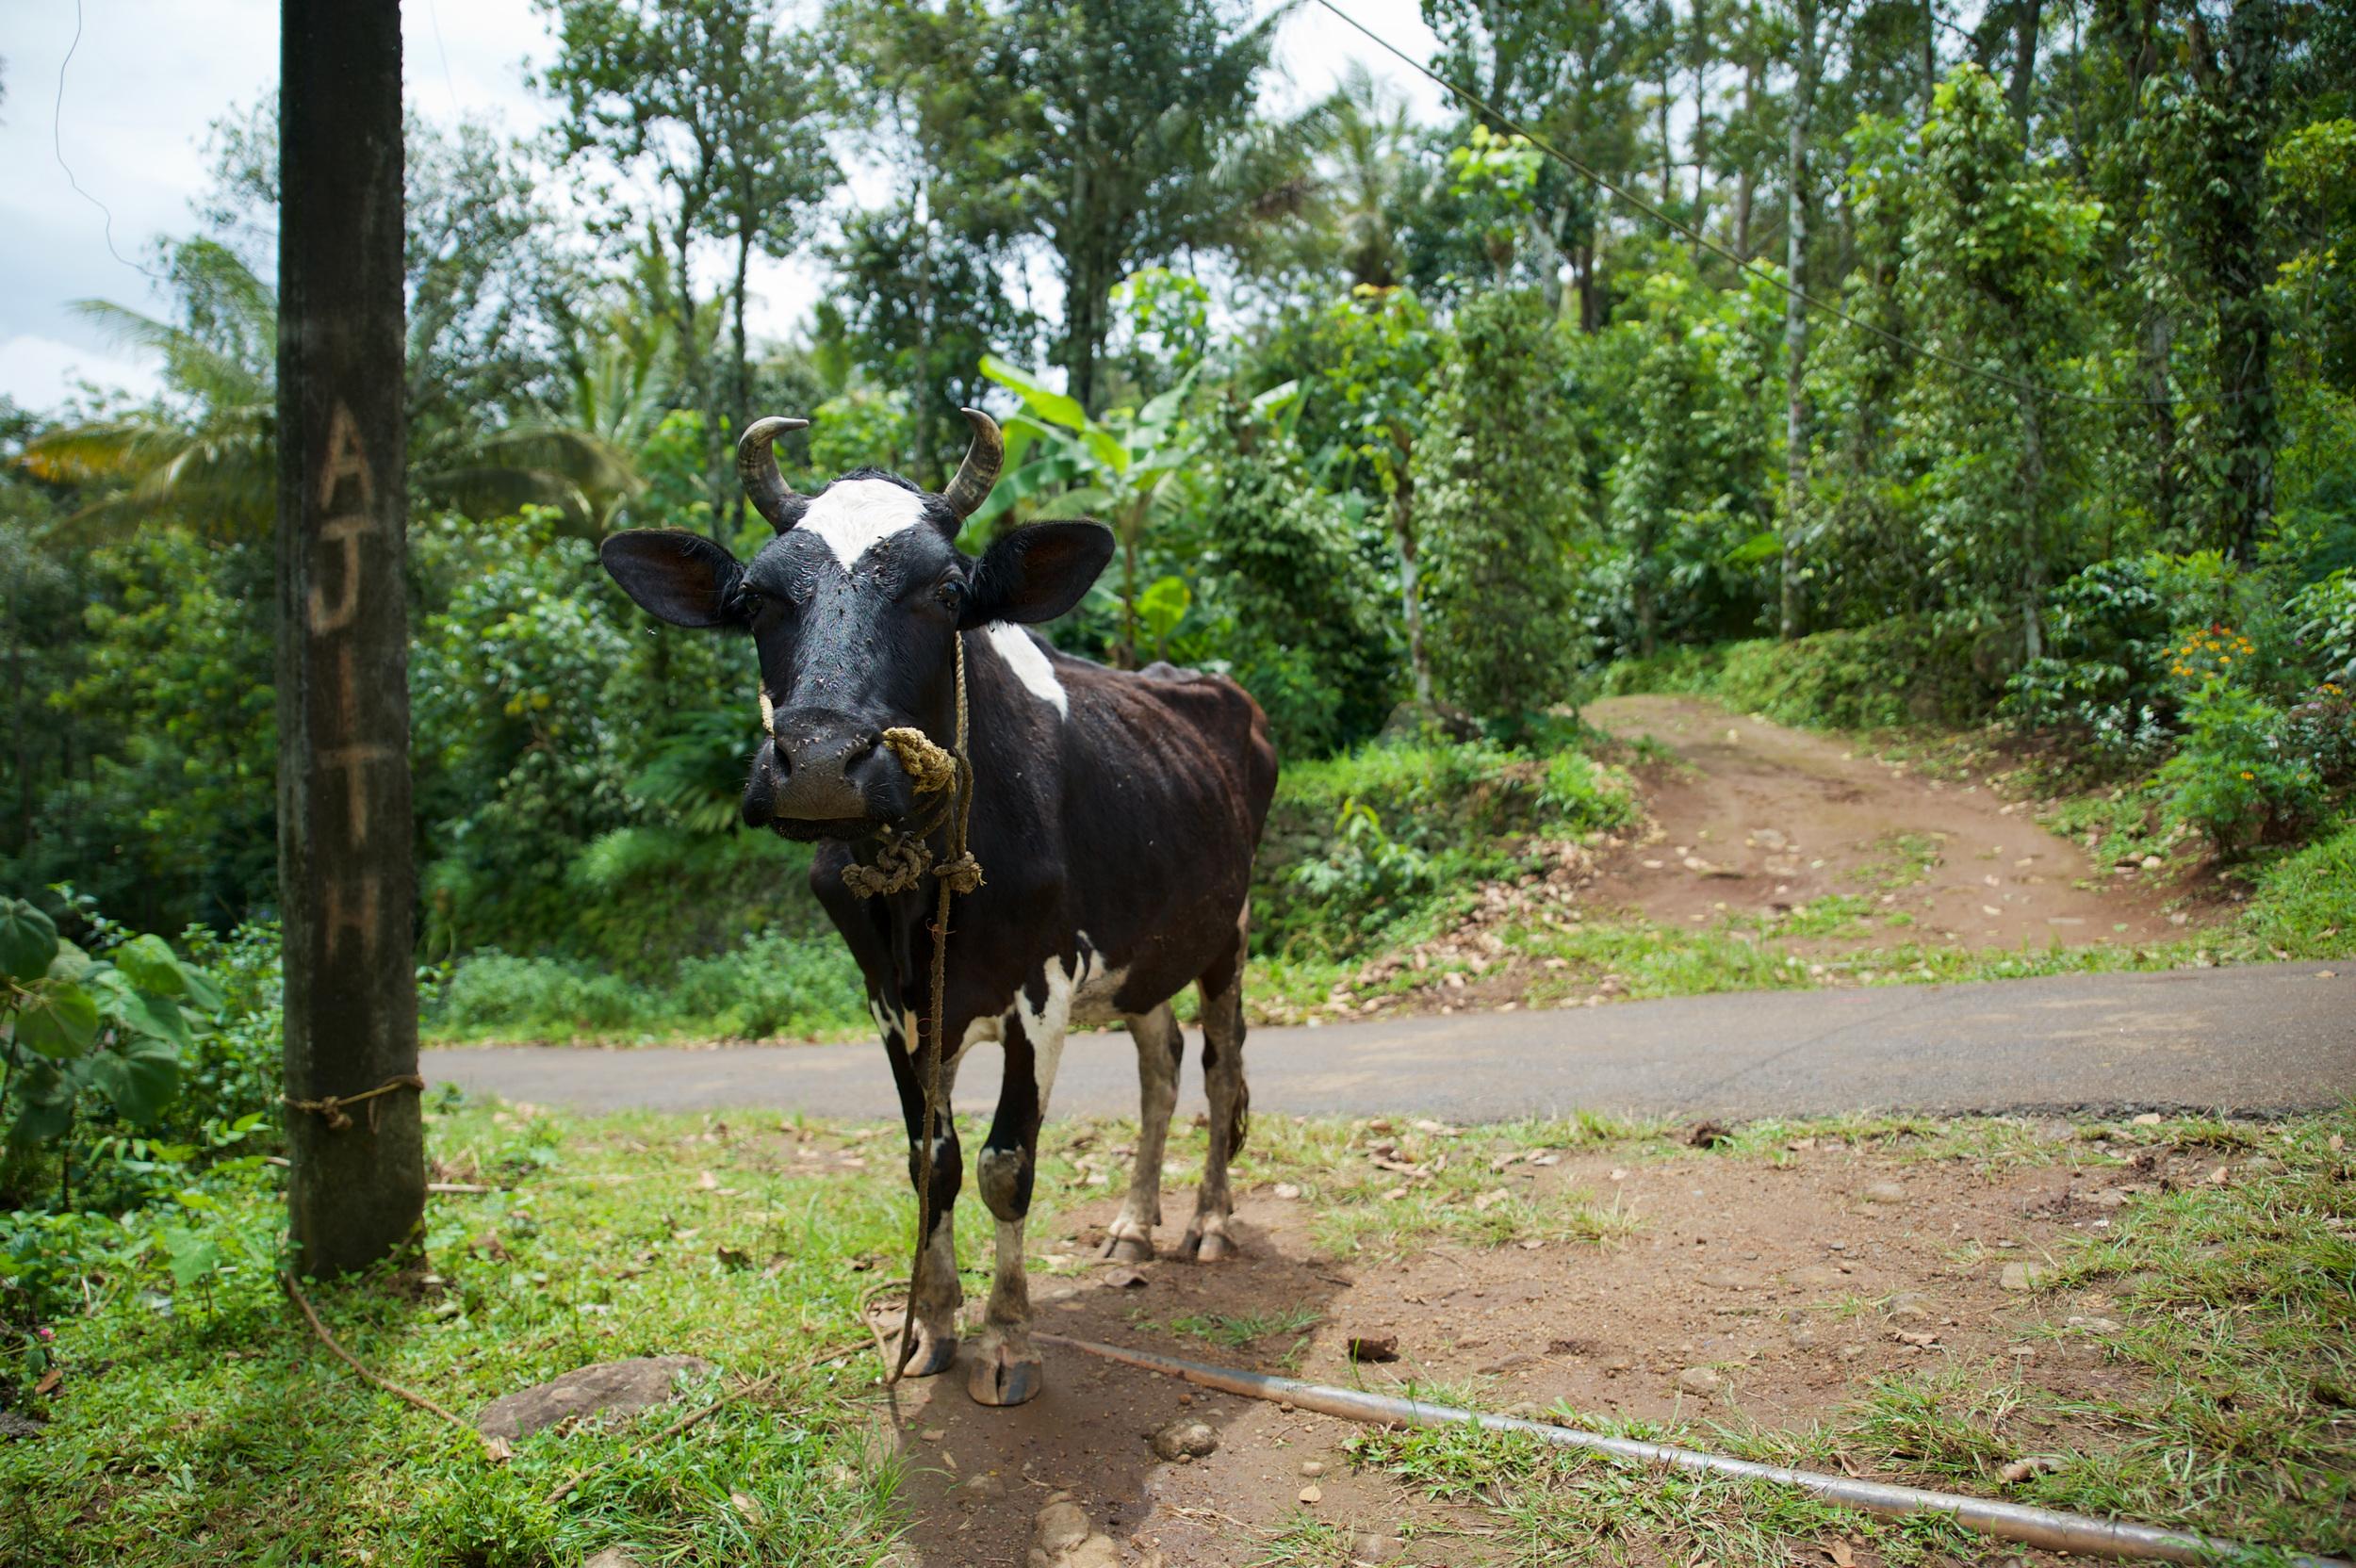 The compulsory cow photo